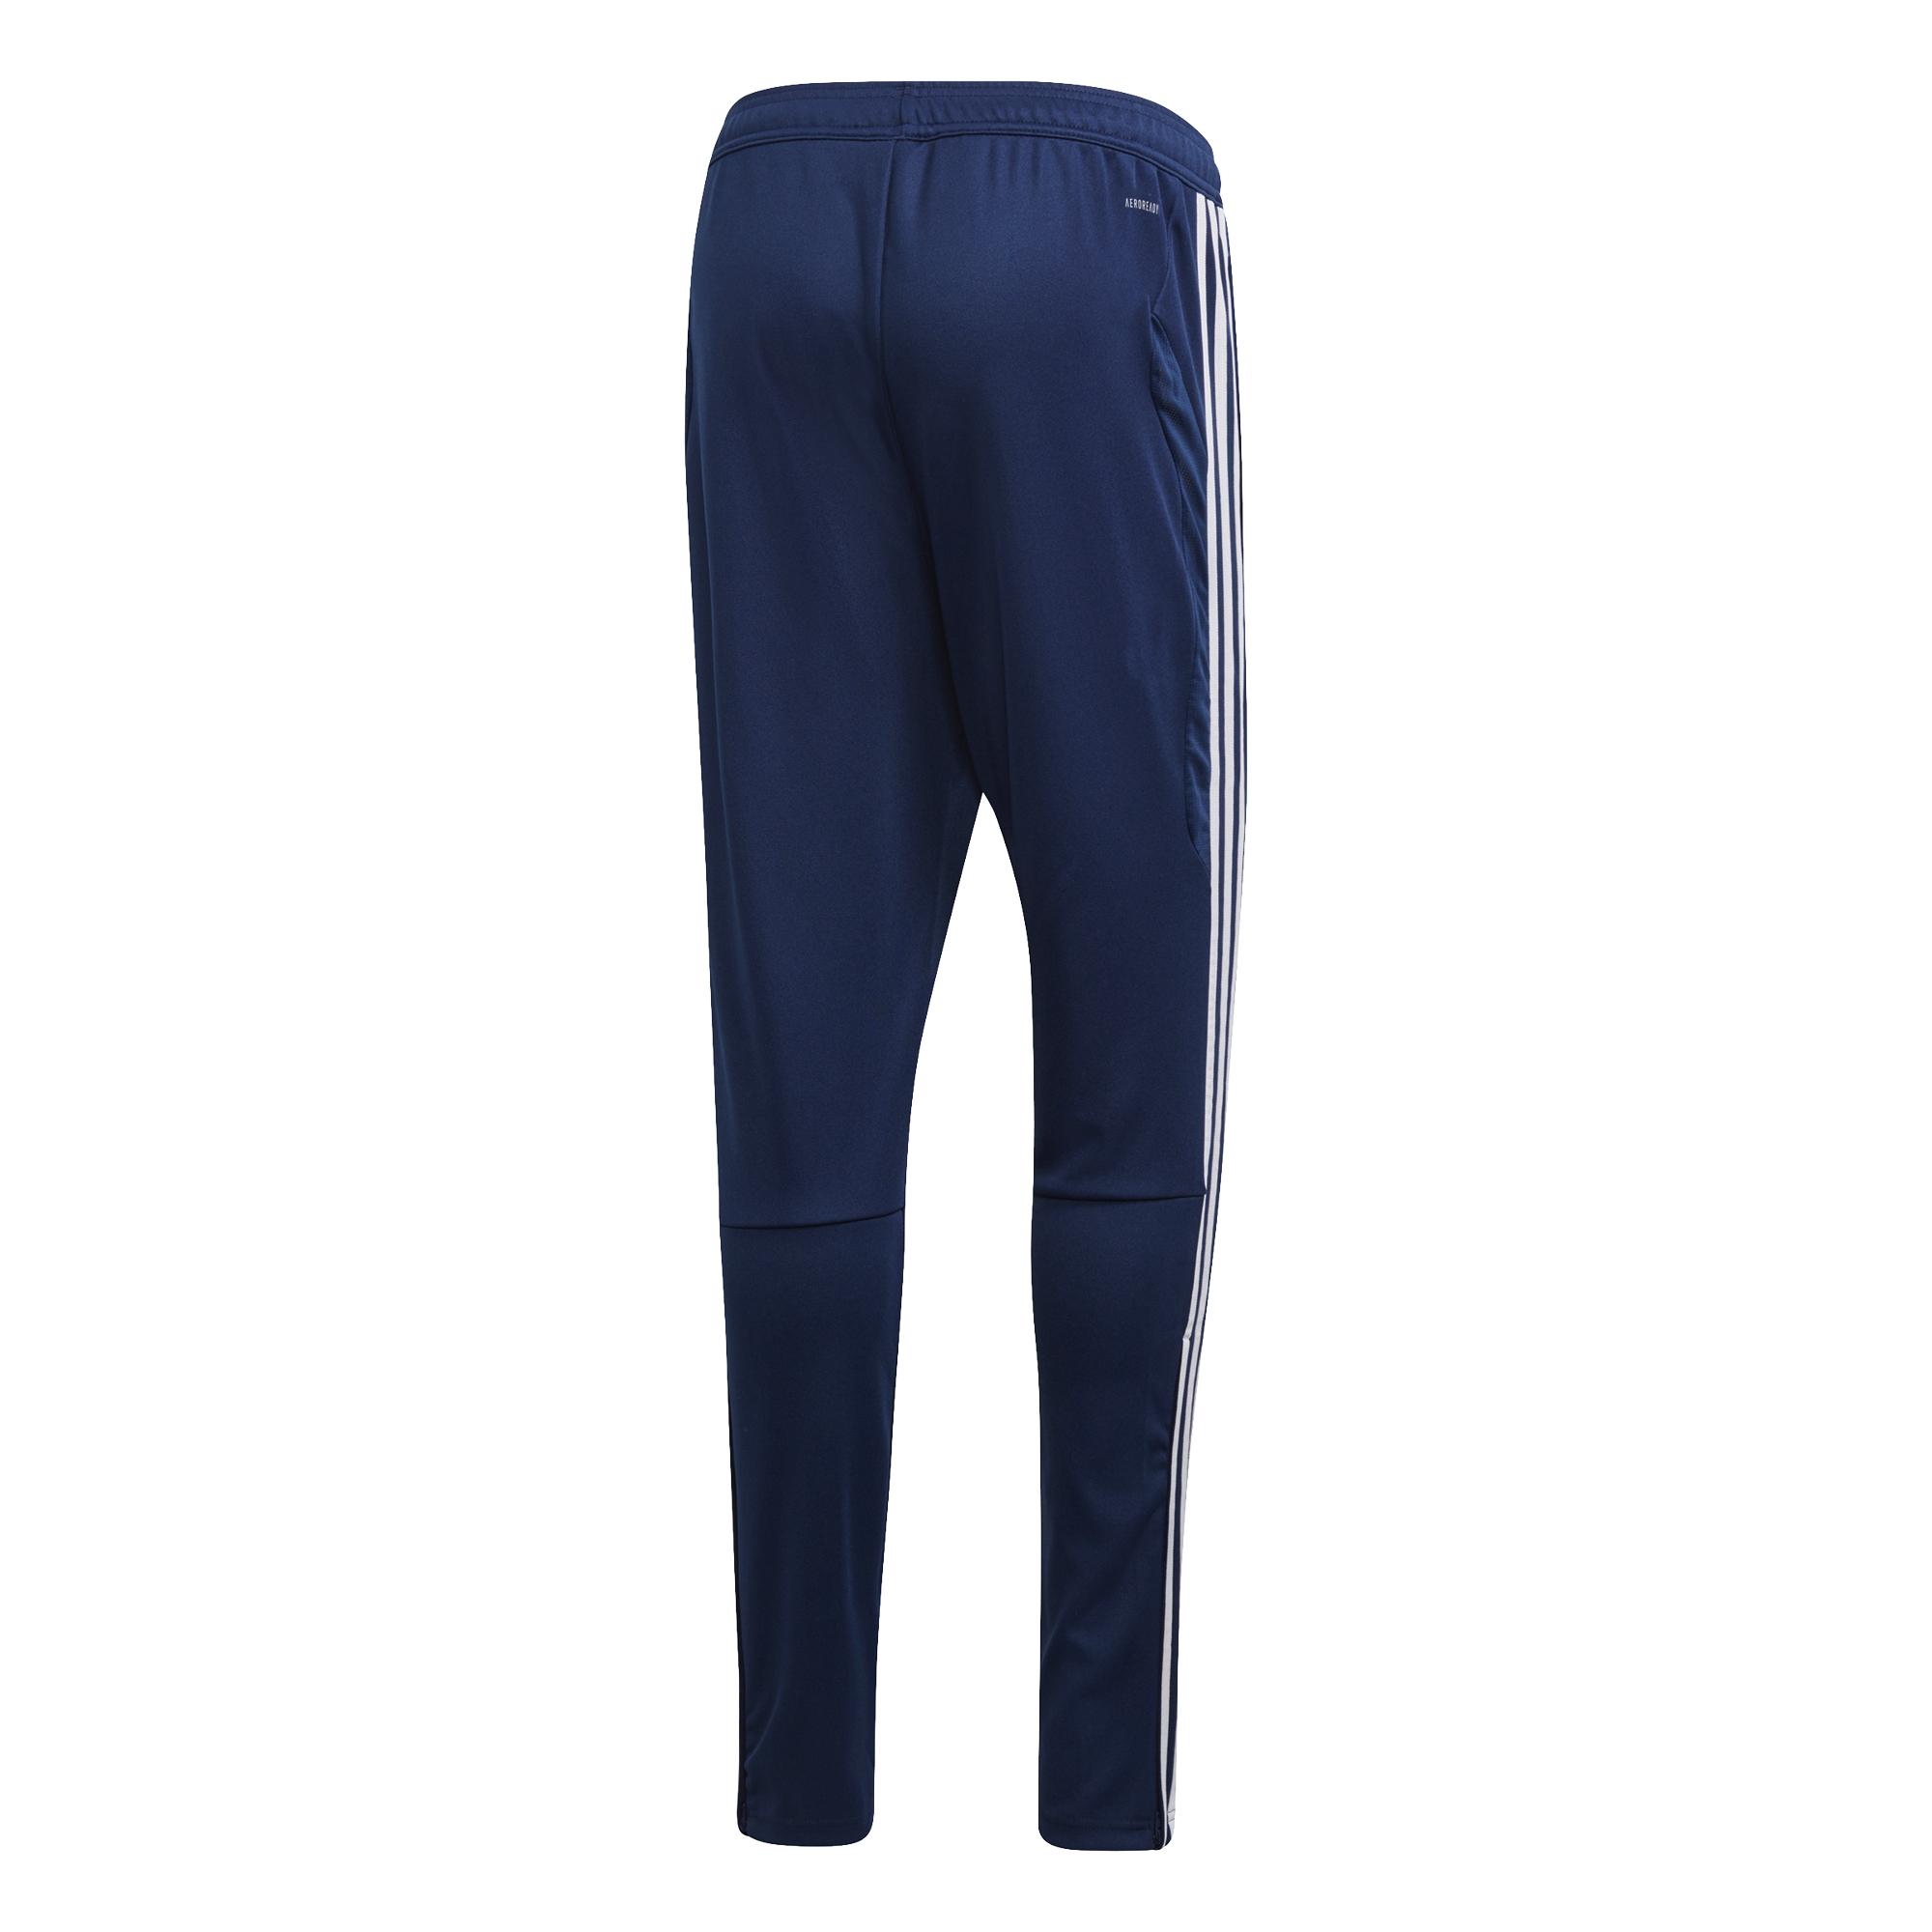 Men's Tiro Soccer Pants, Navy, swatch